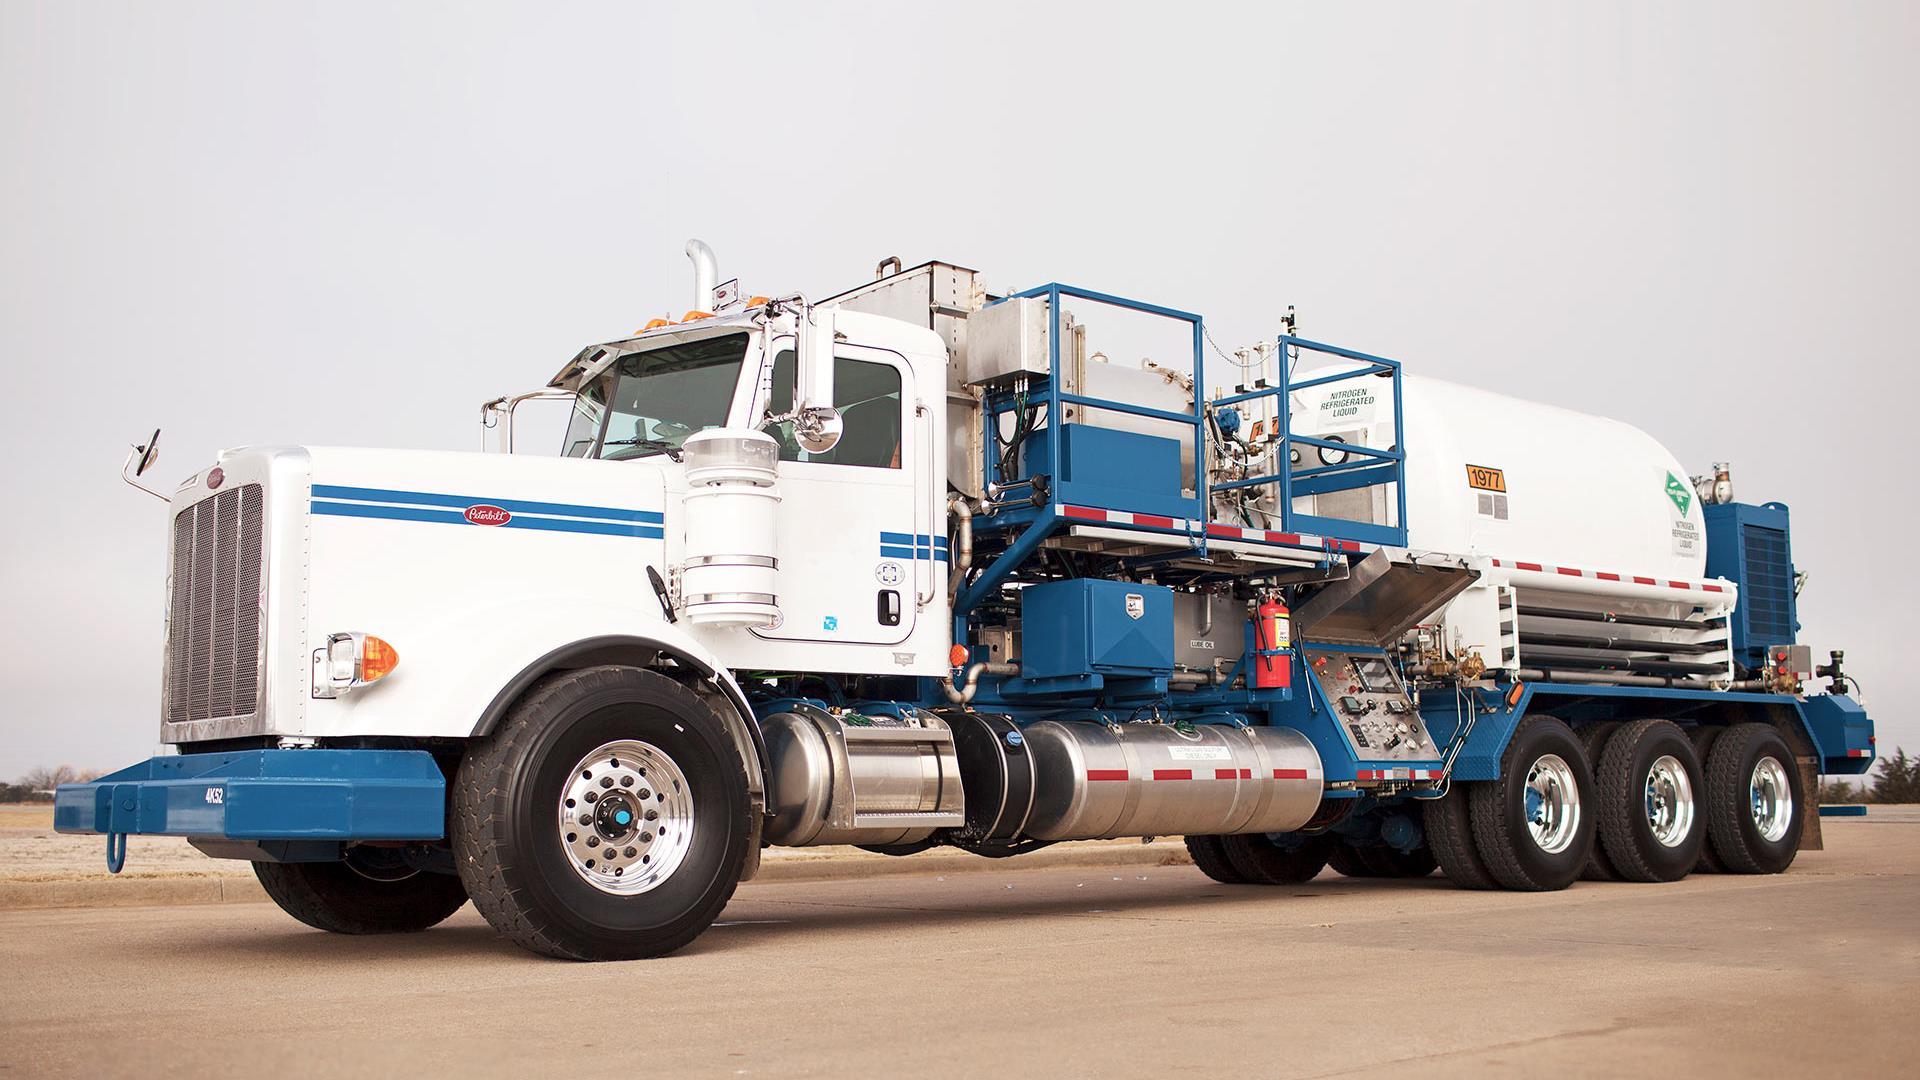 Baker Hughes branded Truck-mounted Nitrogen Unit